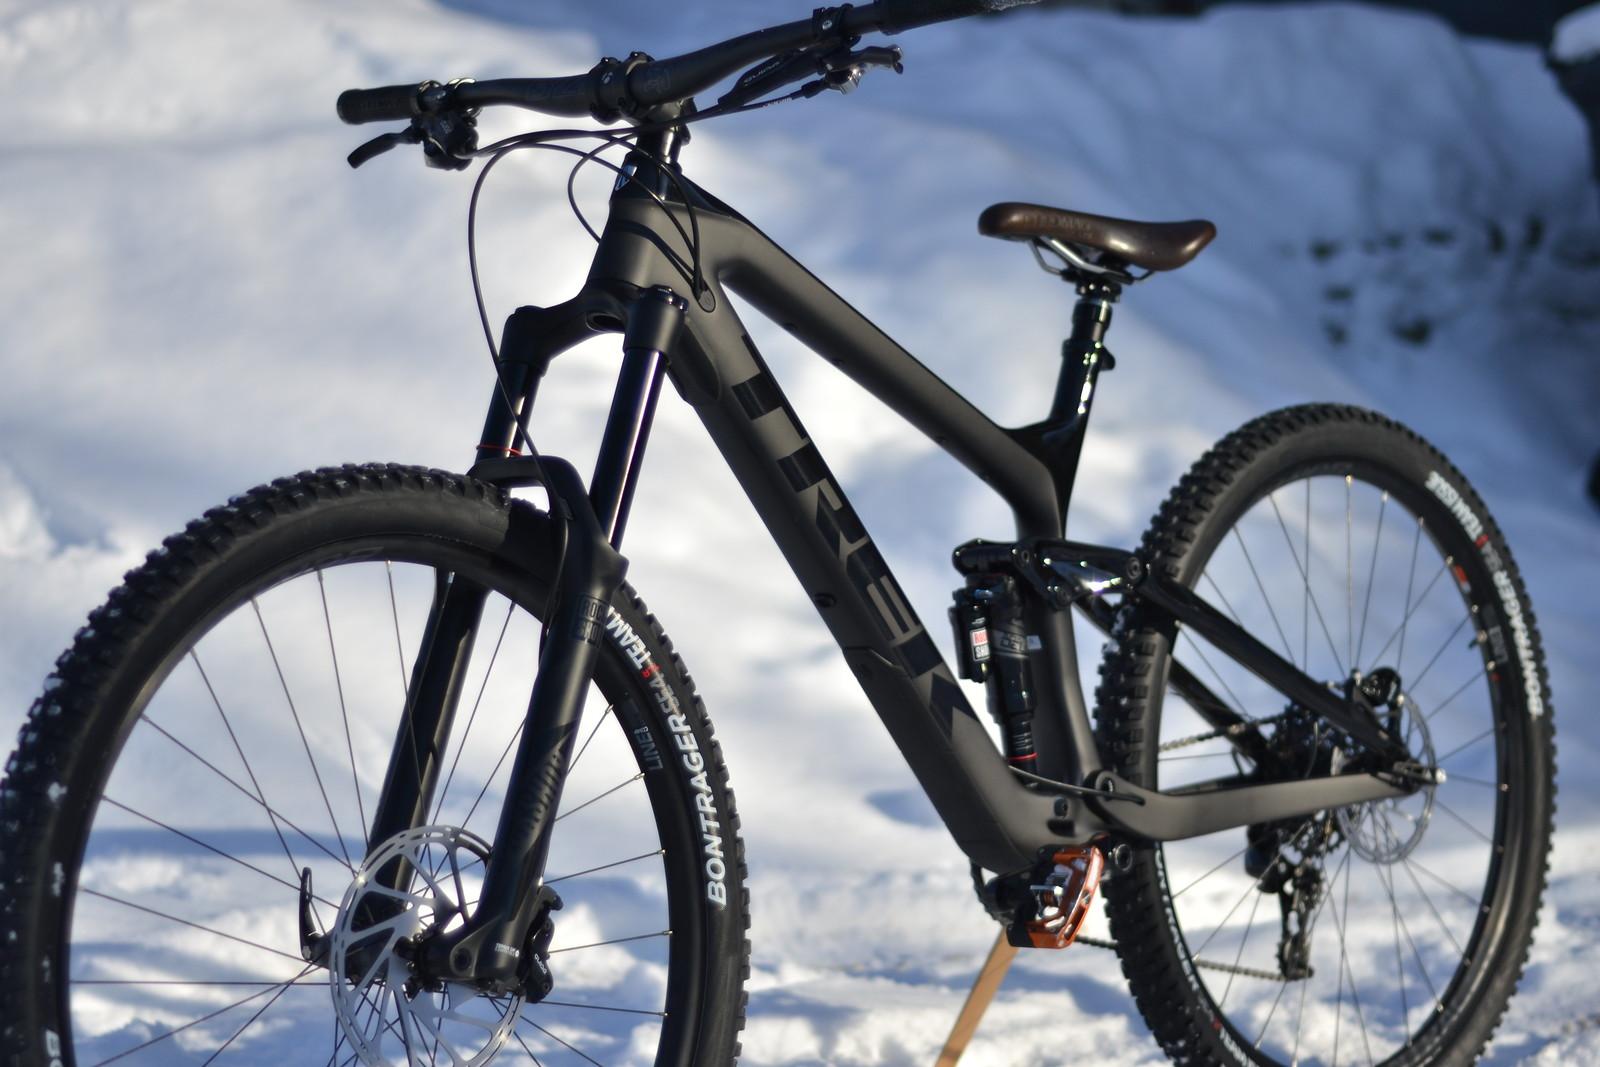 2017 Trek Slash 9 8 Loiic33 S Bike Check Vital Mtb